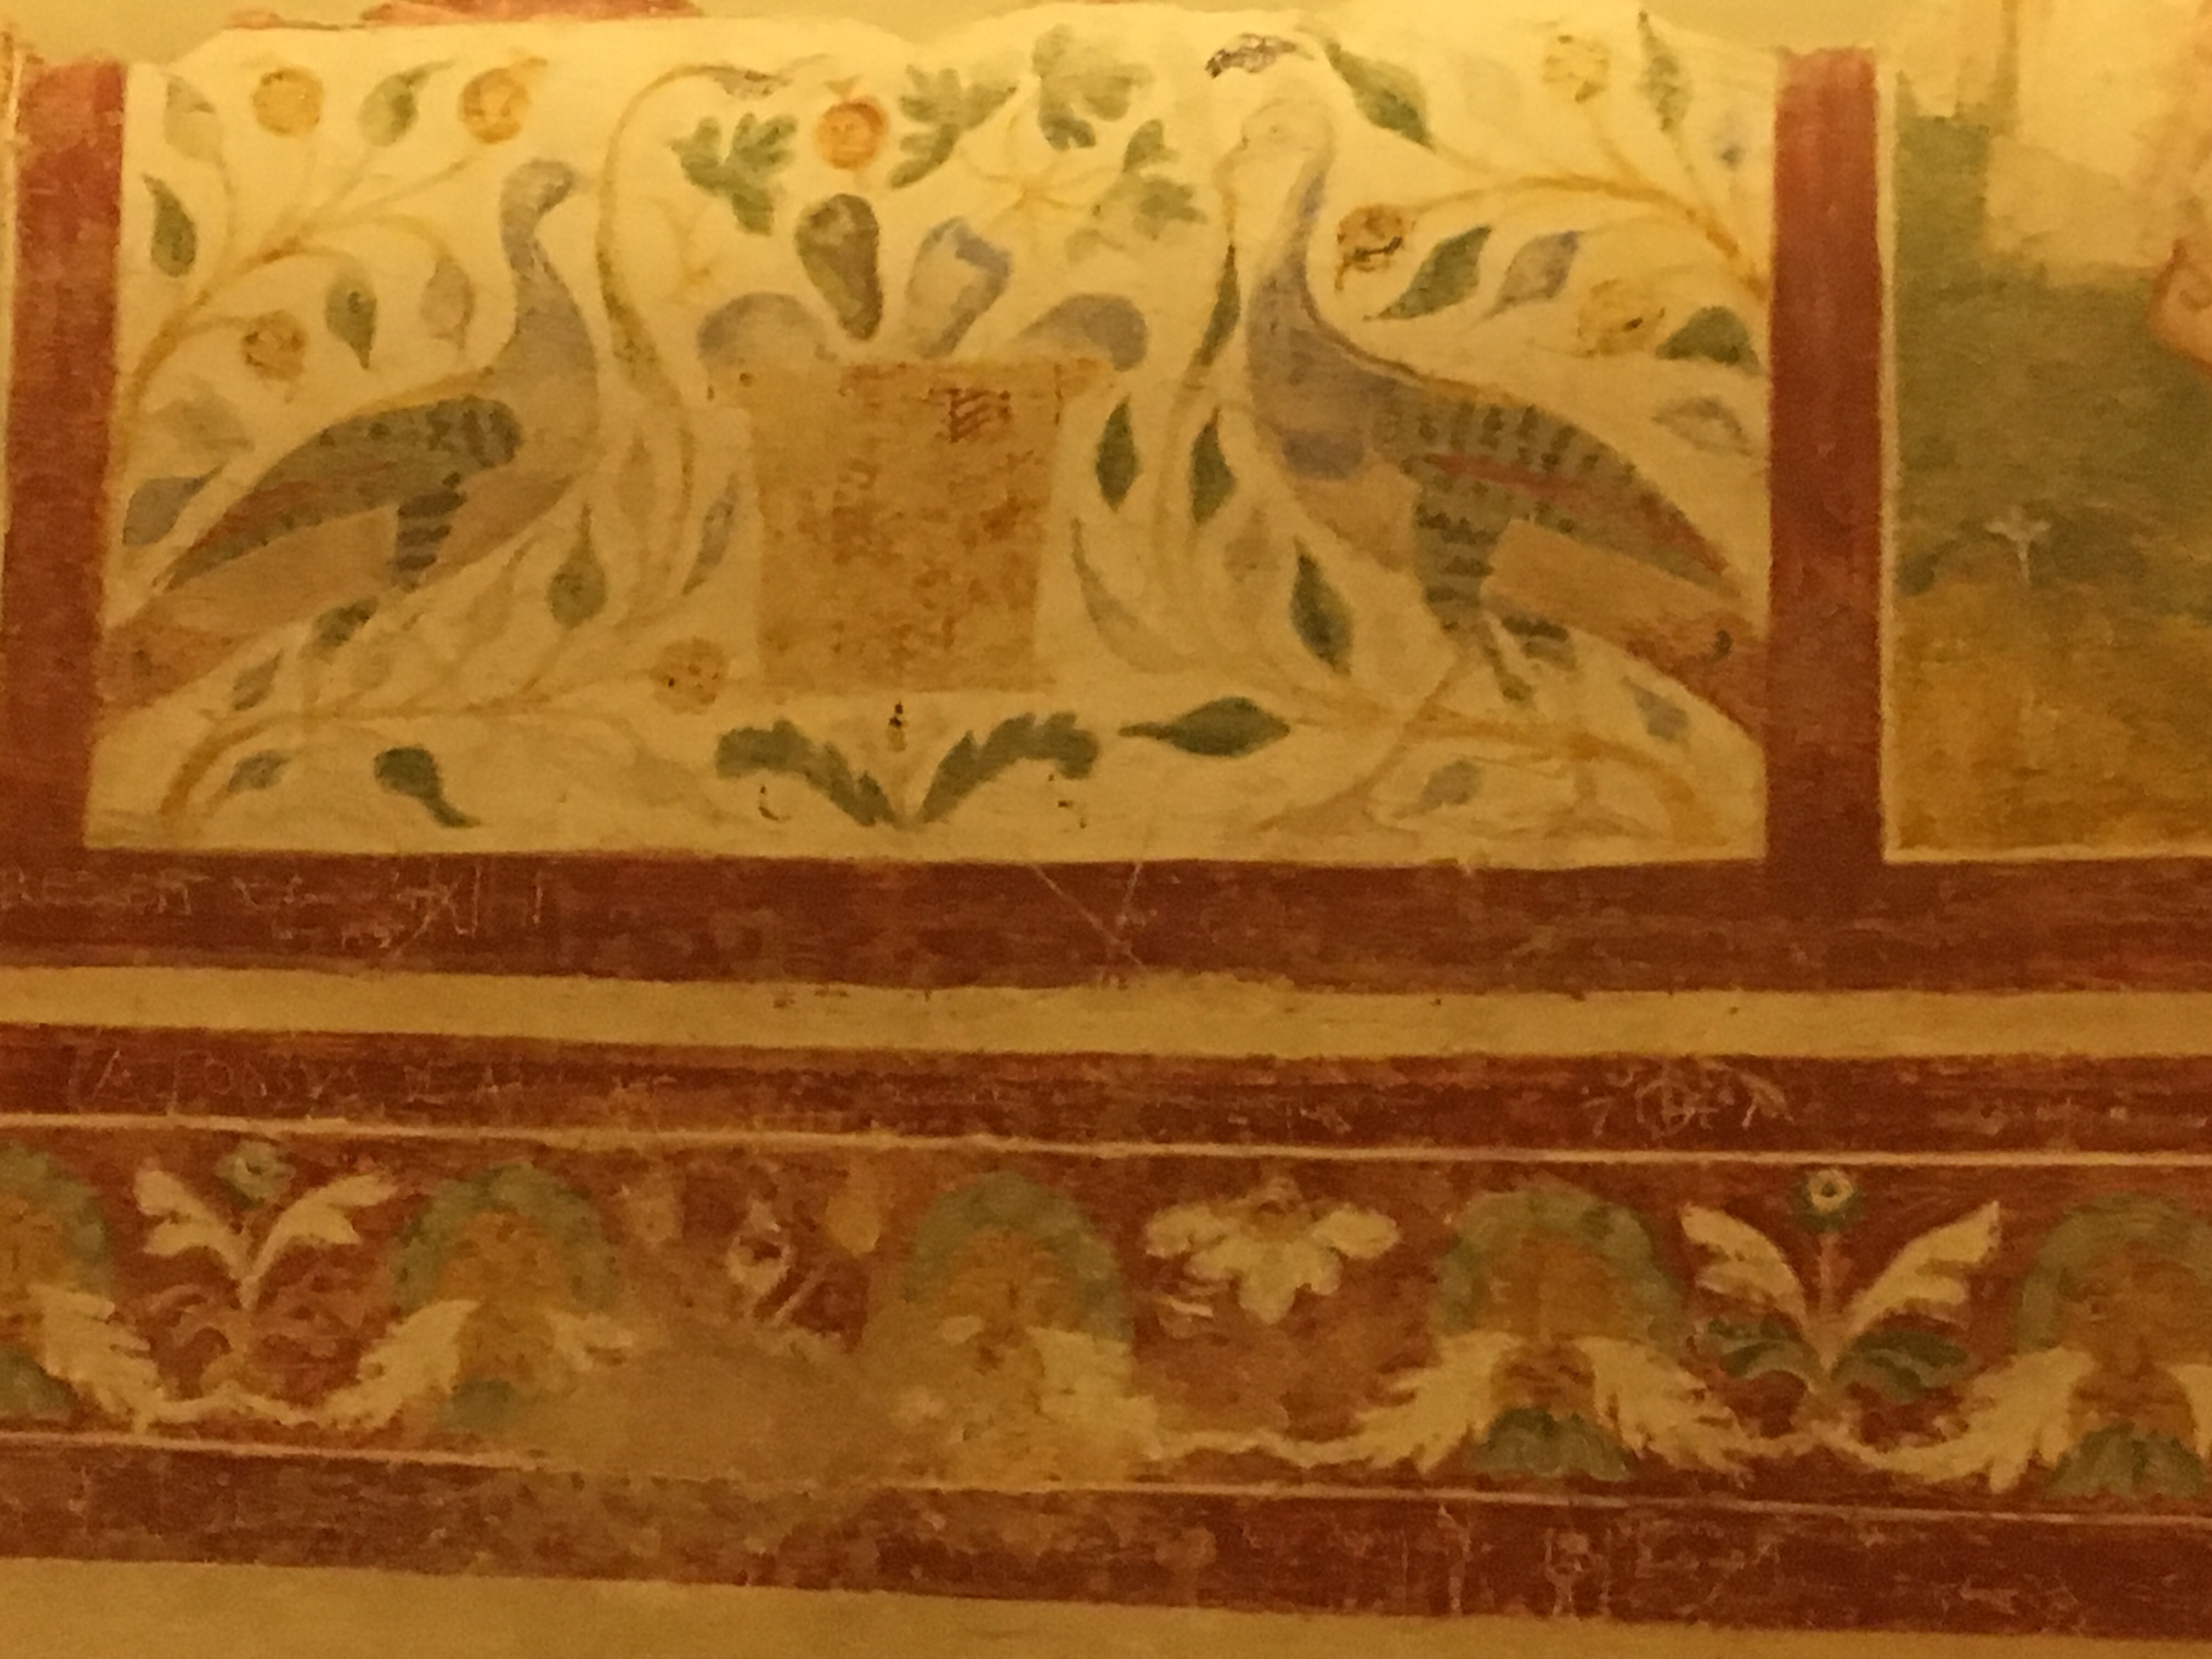 Aquileia Crypt Frescoes - 13th century